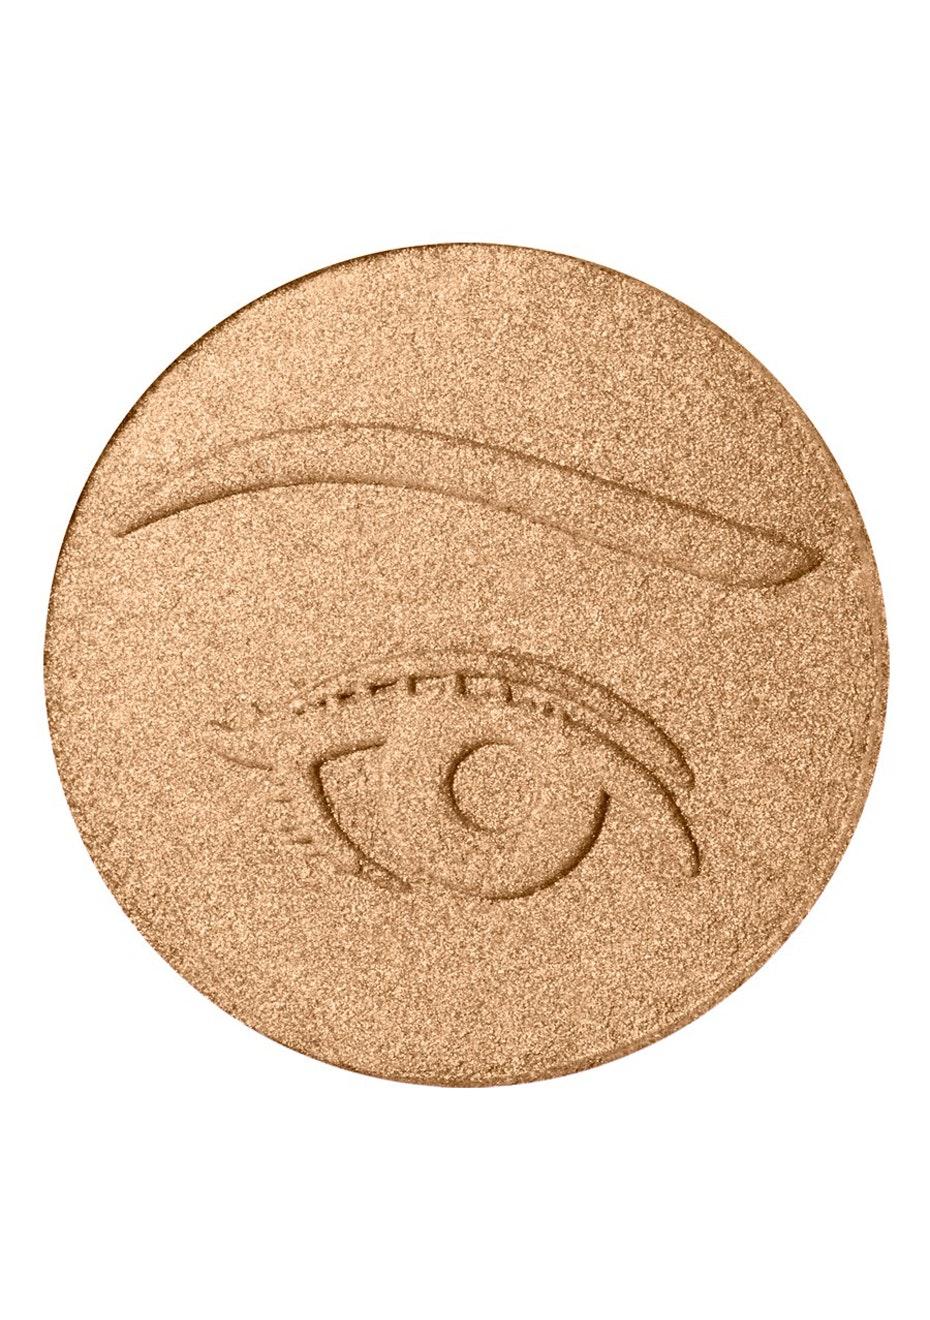 e.l.f Essentials Custom Eyes Moondust 2502